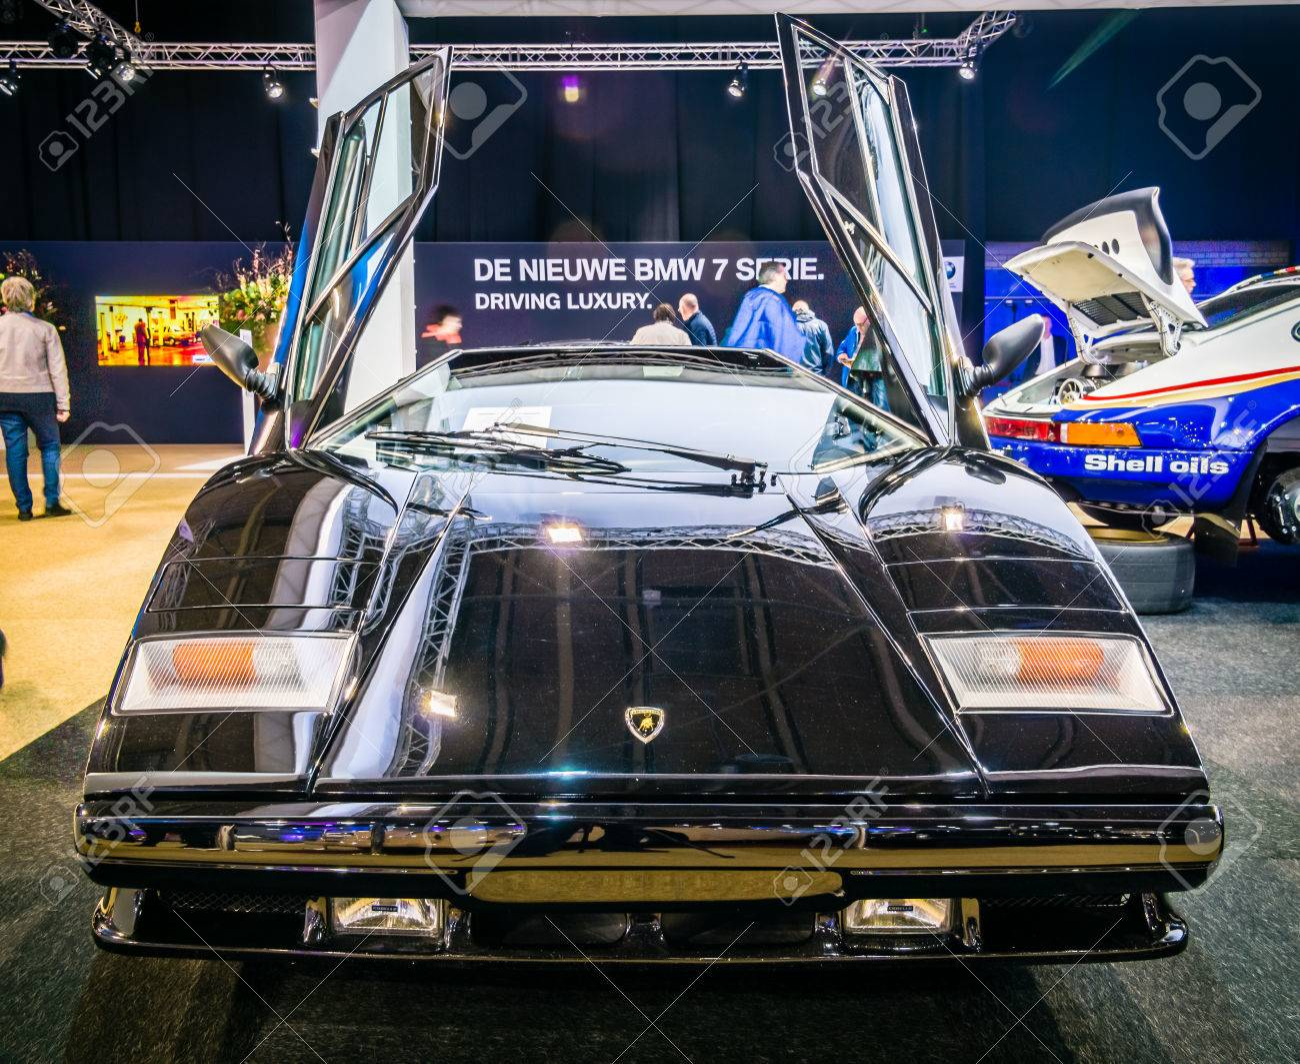 Maastricht Netherlands January 14 2016 Sports Car Lamborghini